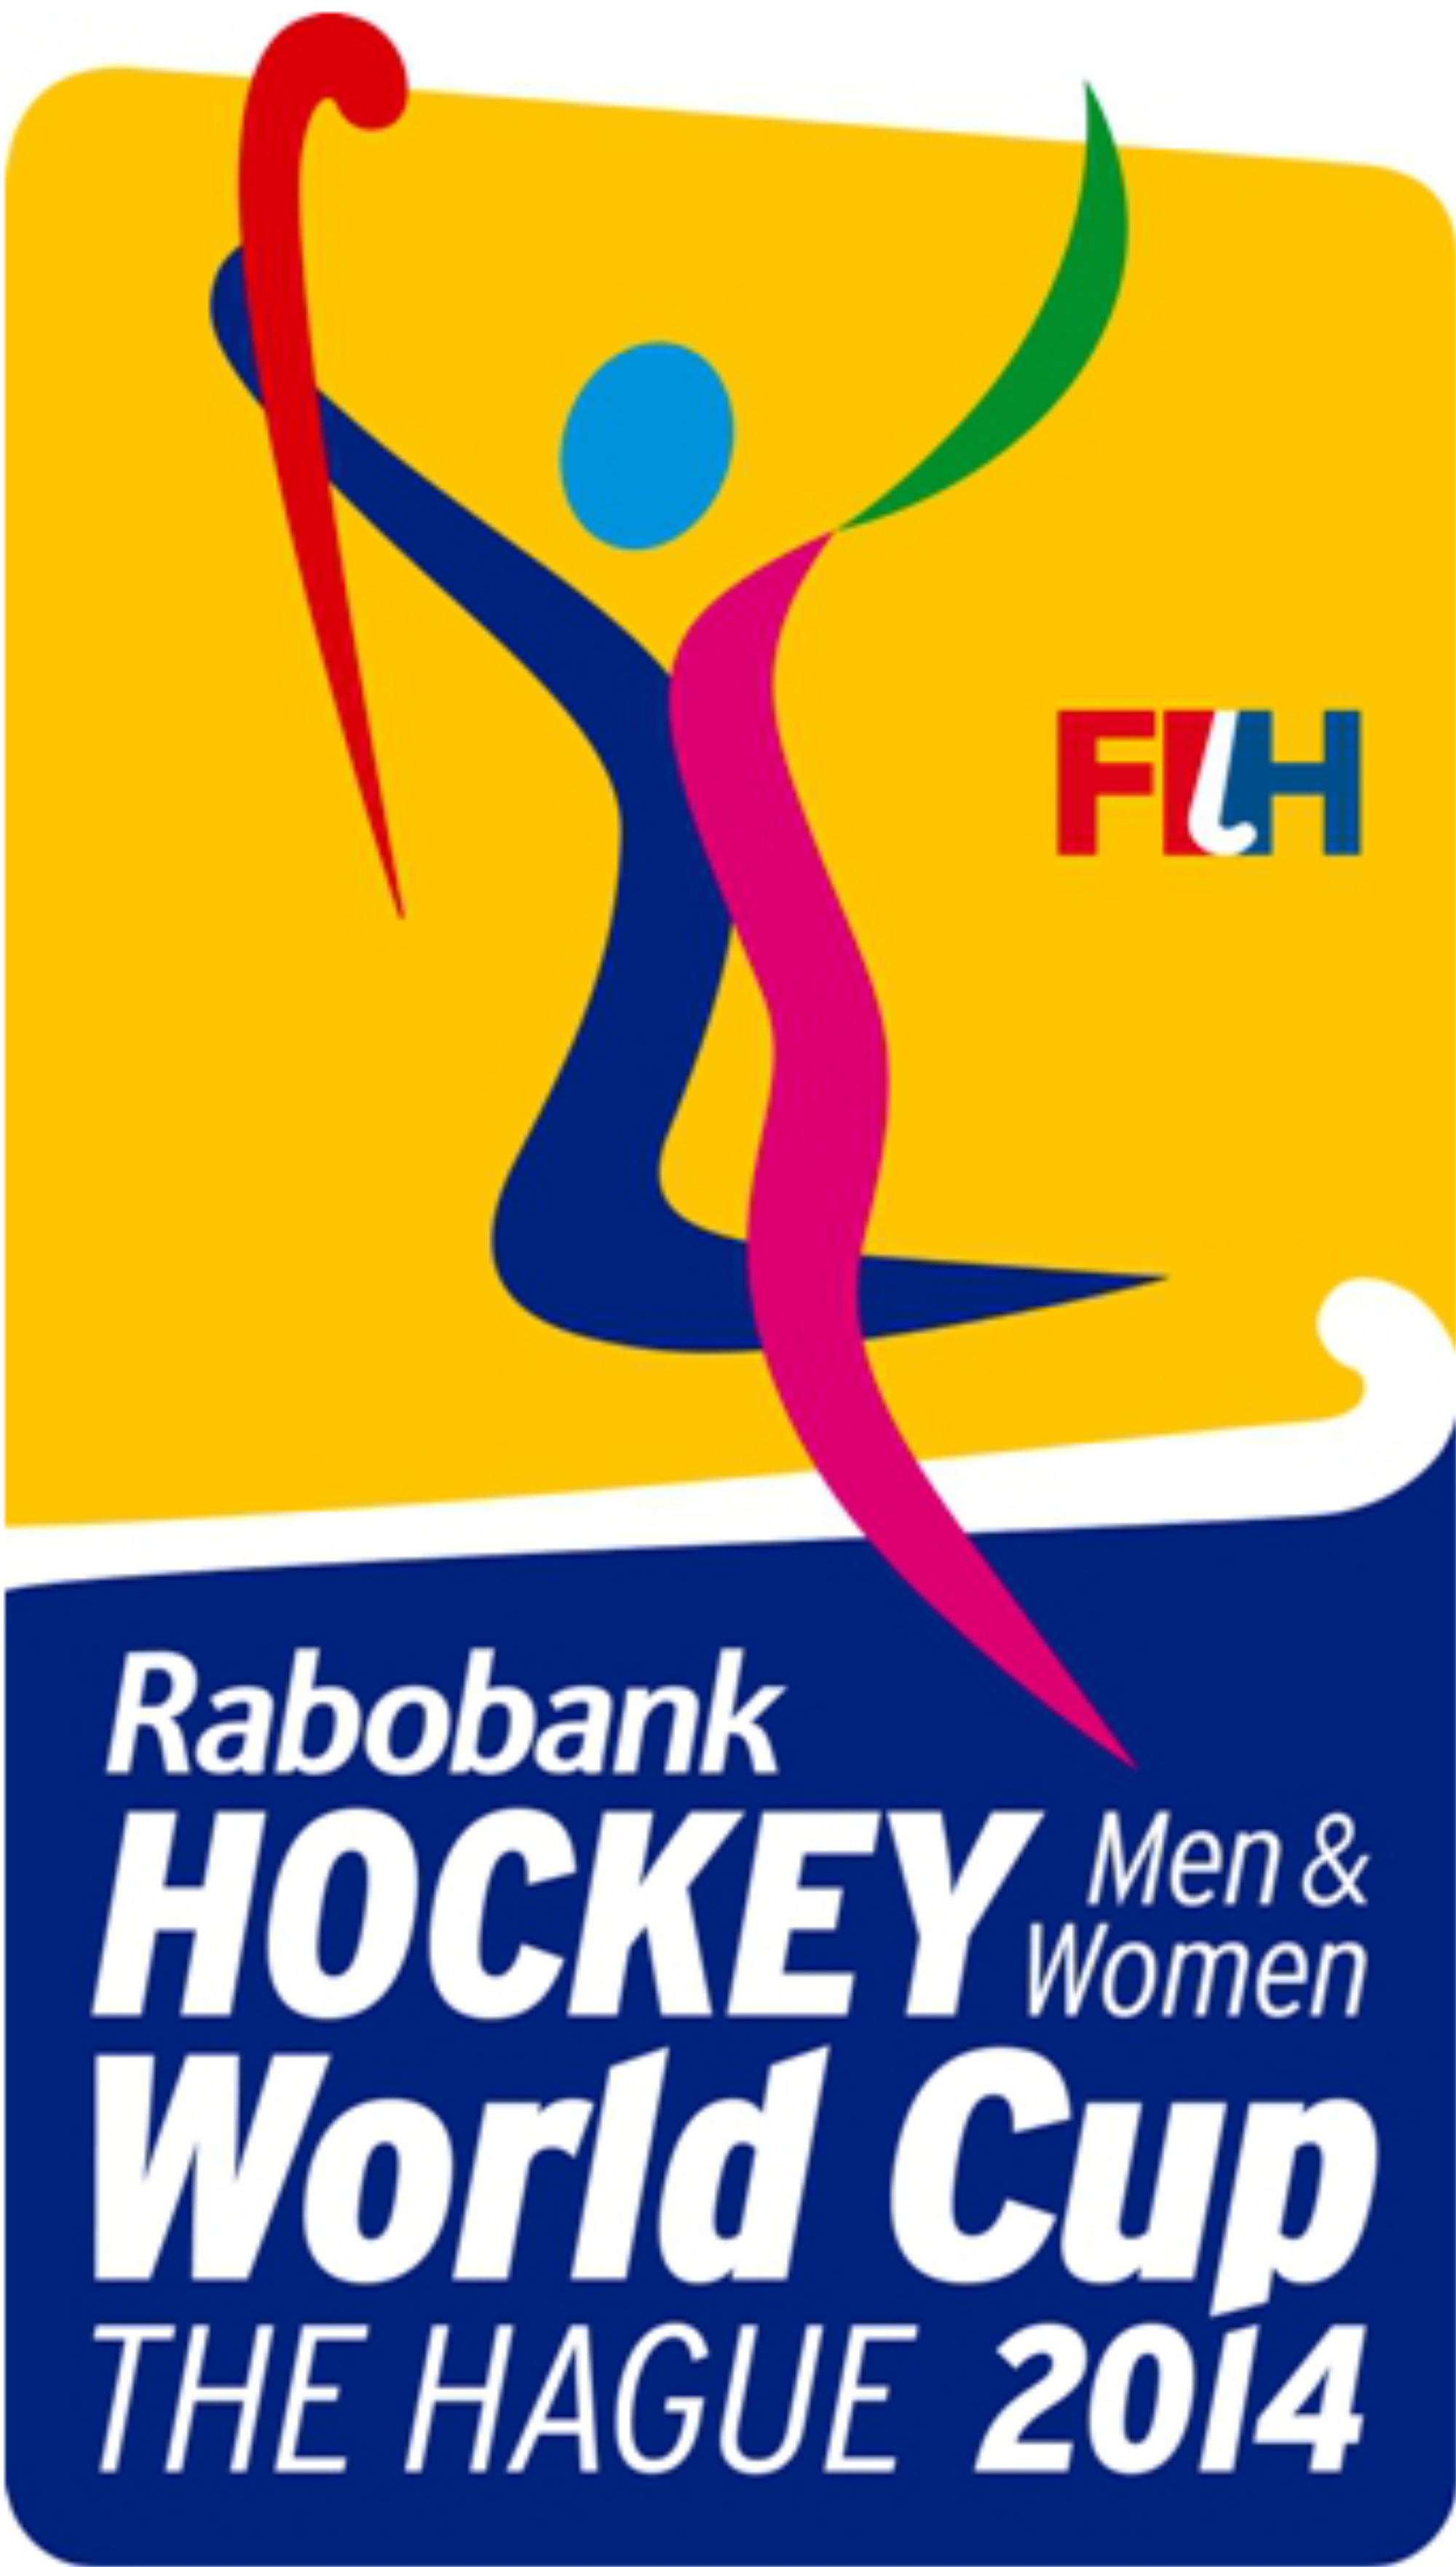 2014_FIH_Hockey_World_Cup_logo.png